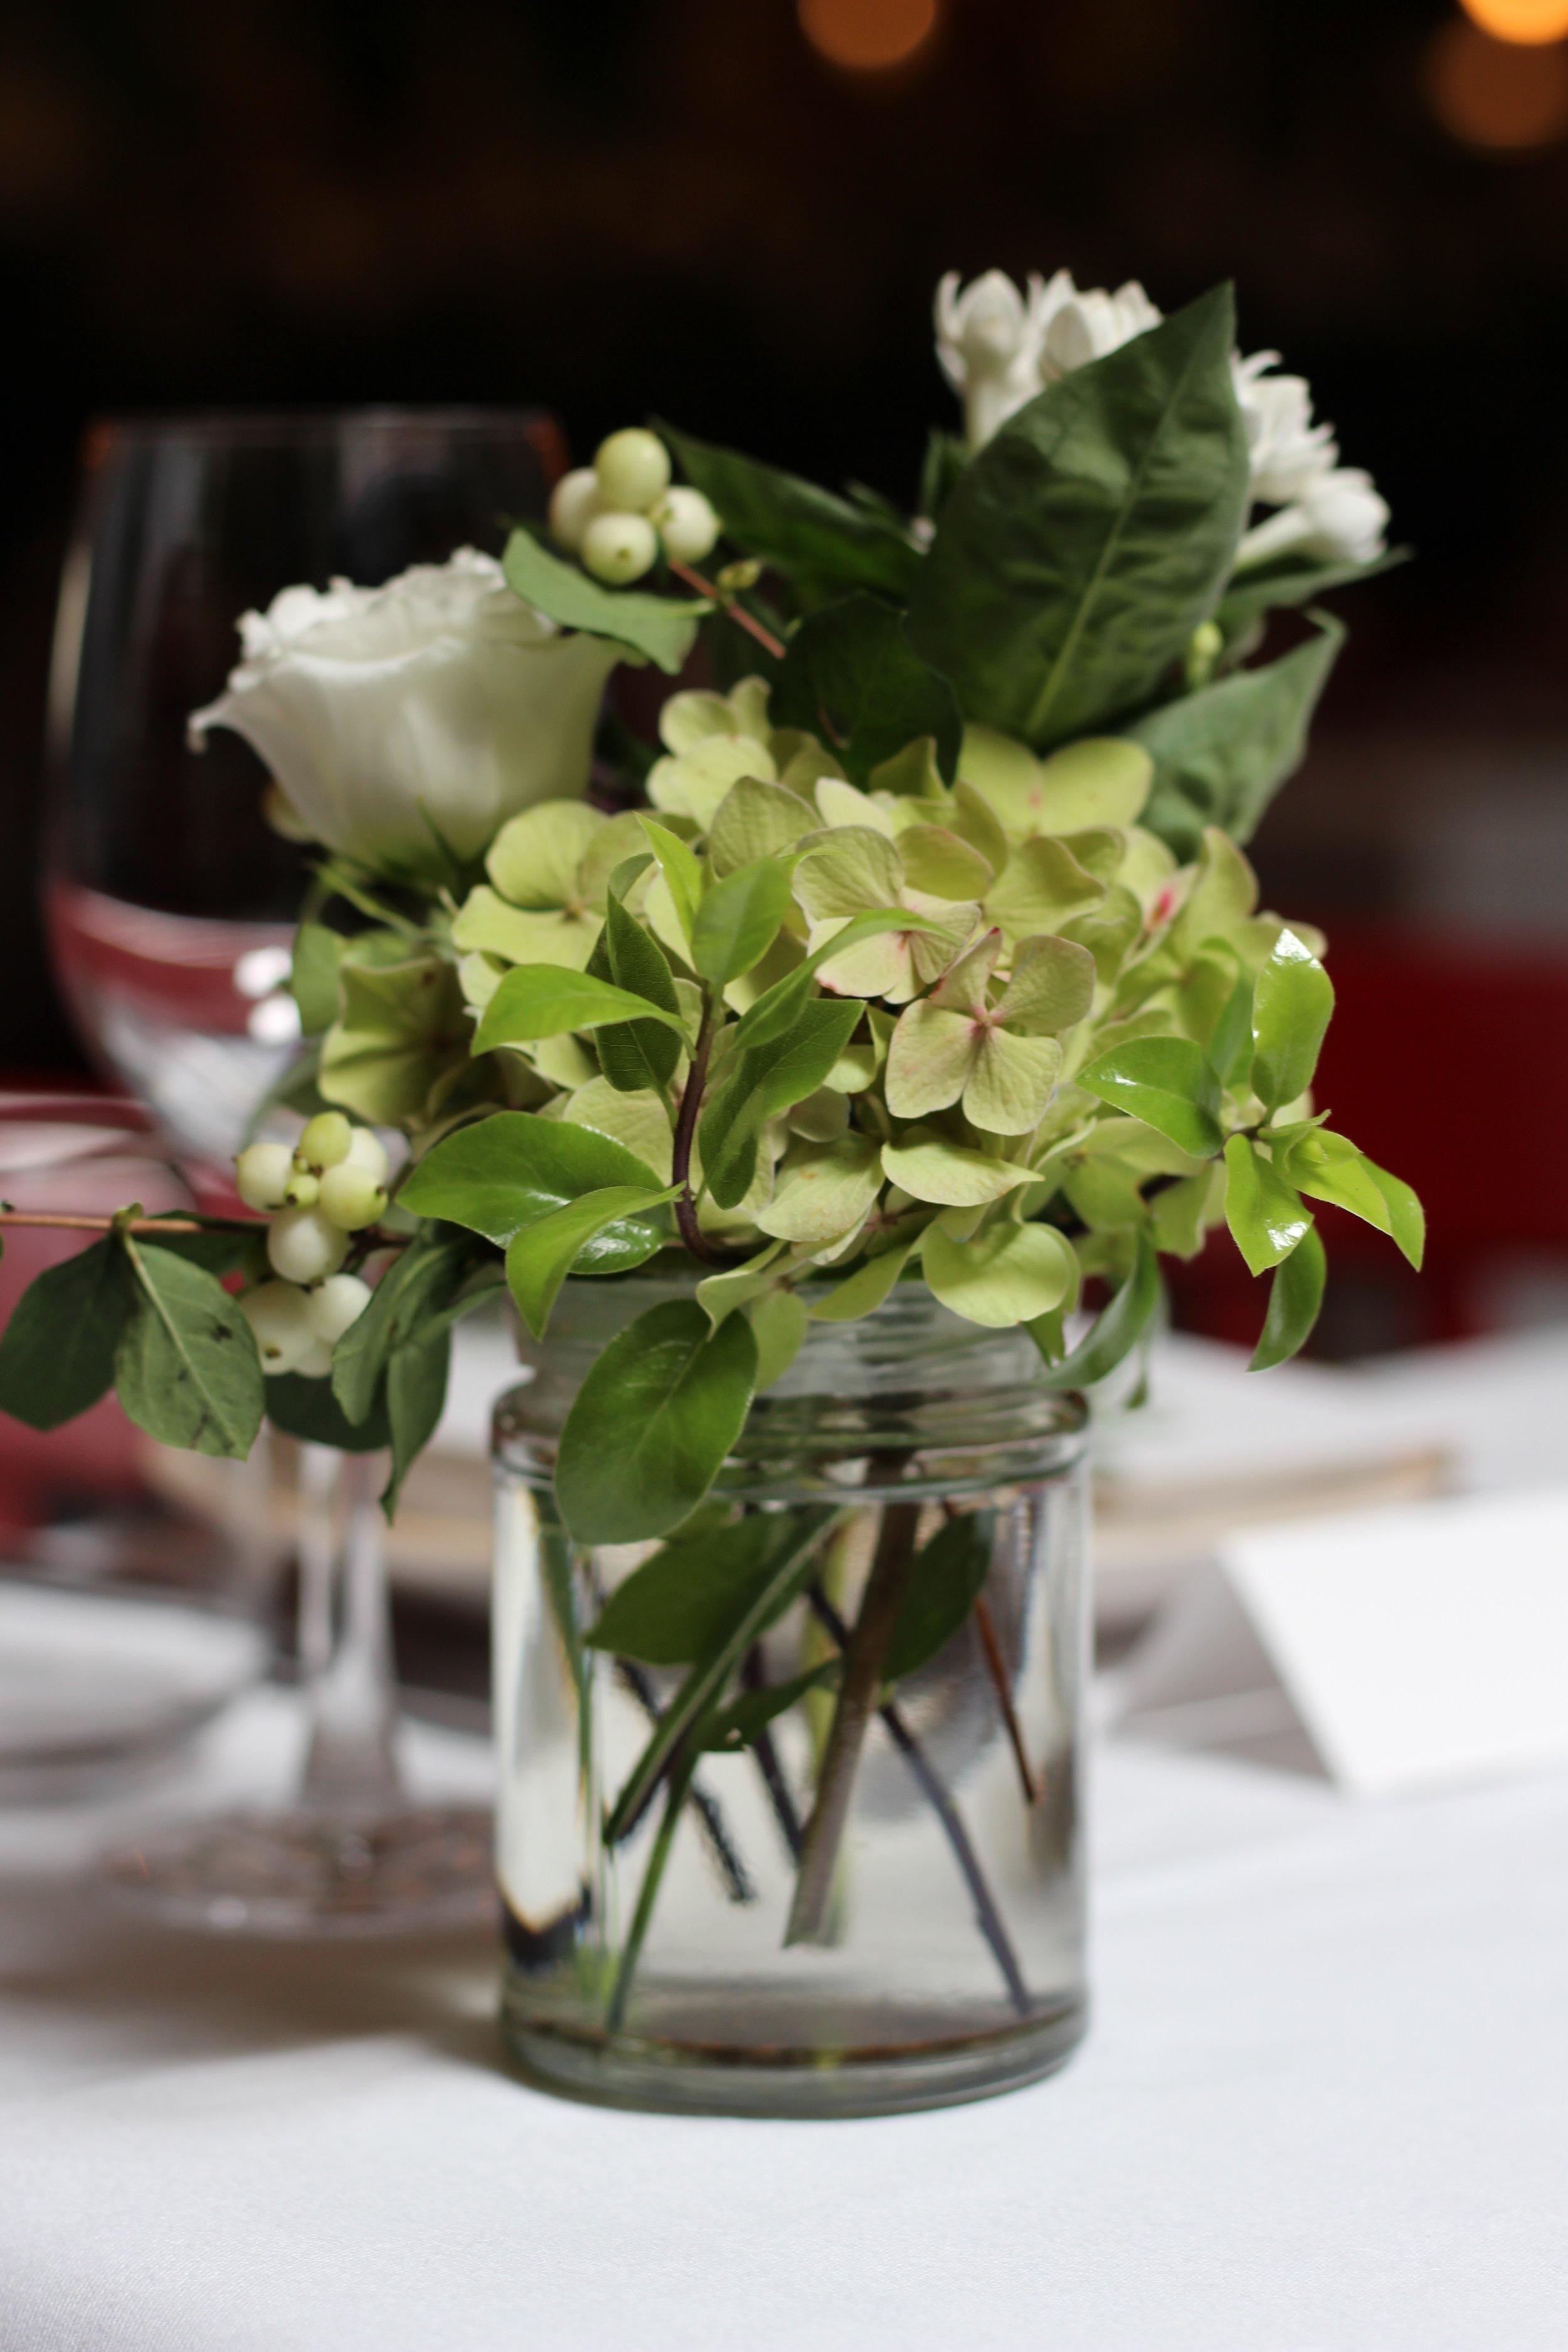 Jennifer Pinder Kent London florist flowers does a botanical themed green and white wedding at Jamies italain restaurant in London threadneedle street 1